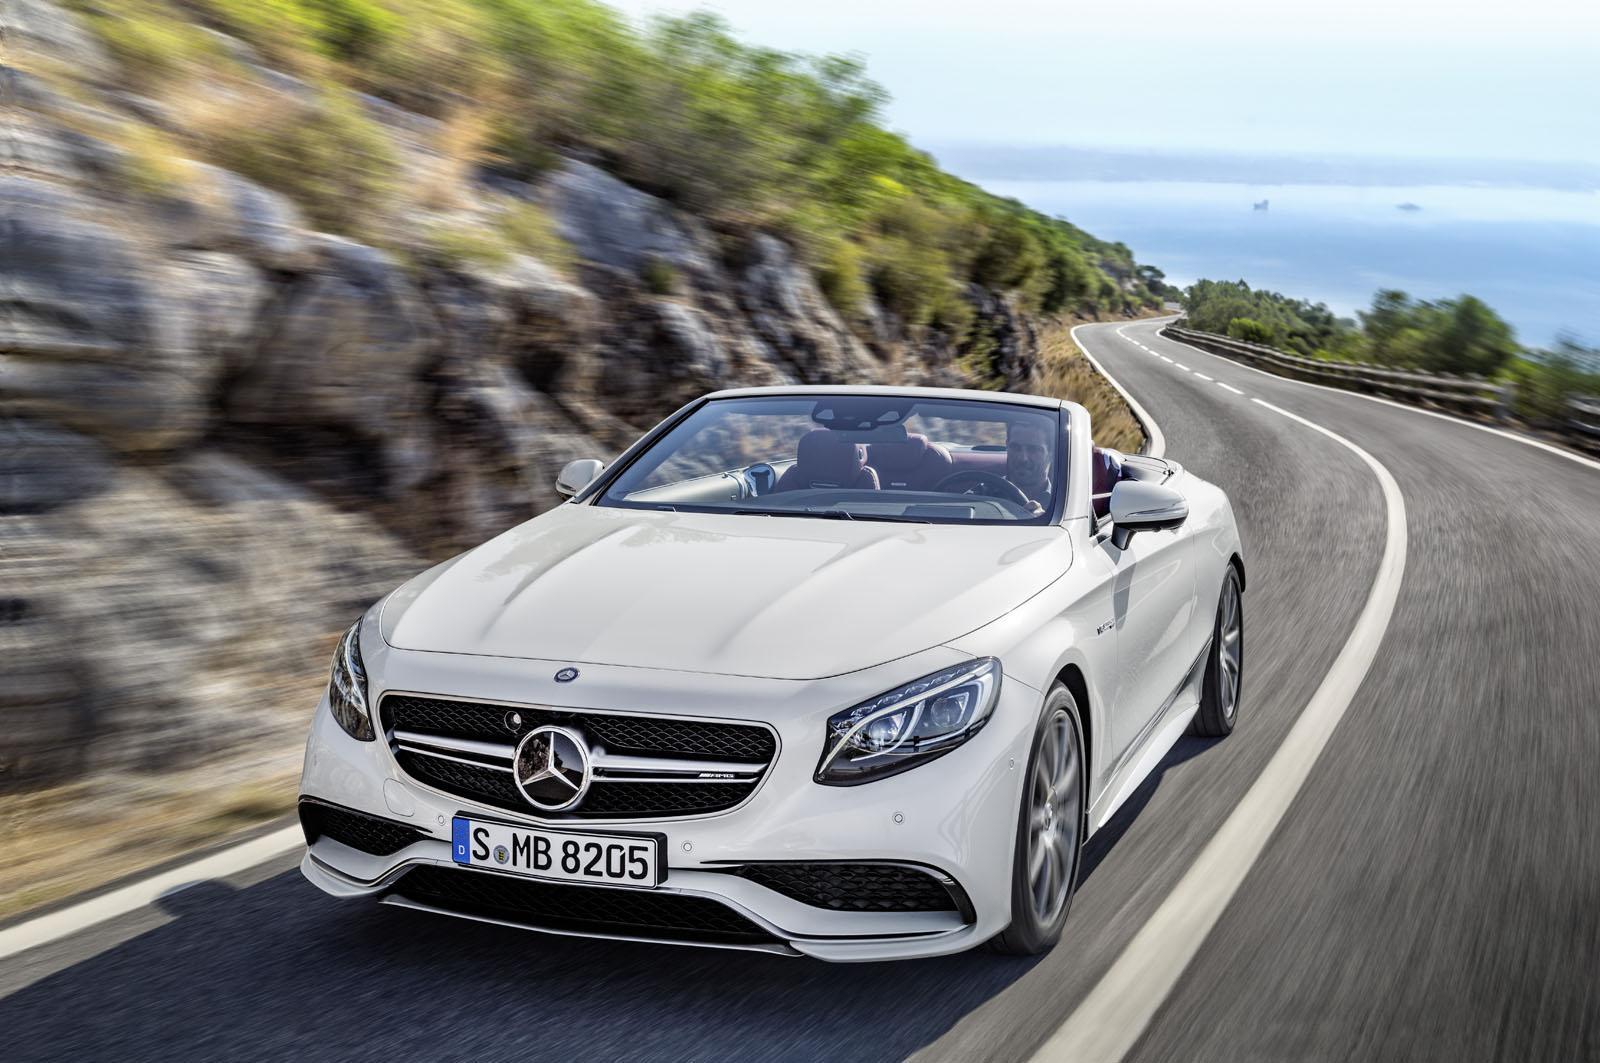 2016 Mercedes-AMG S 63 Cabriolet front quarter unveiled